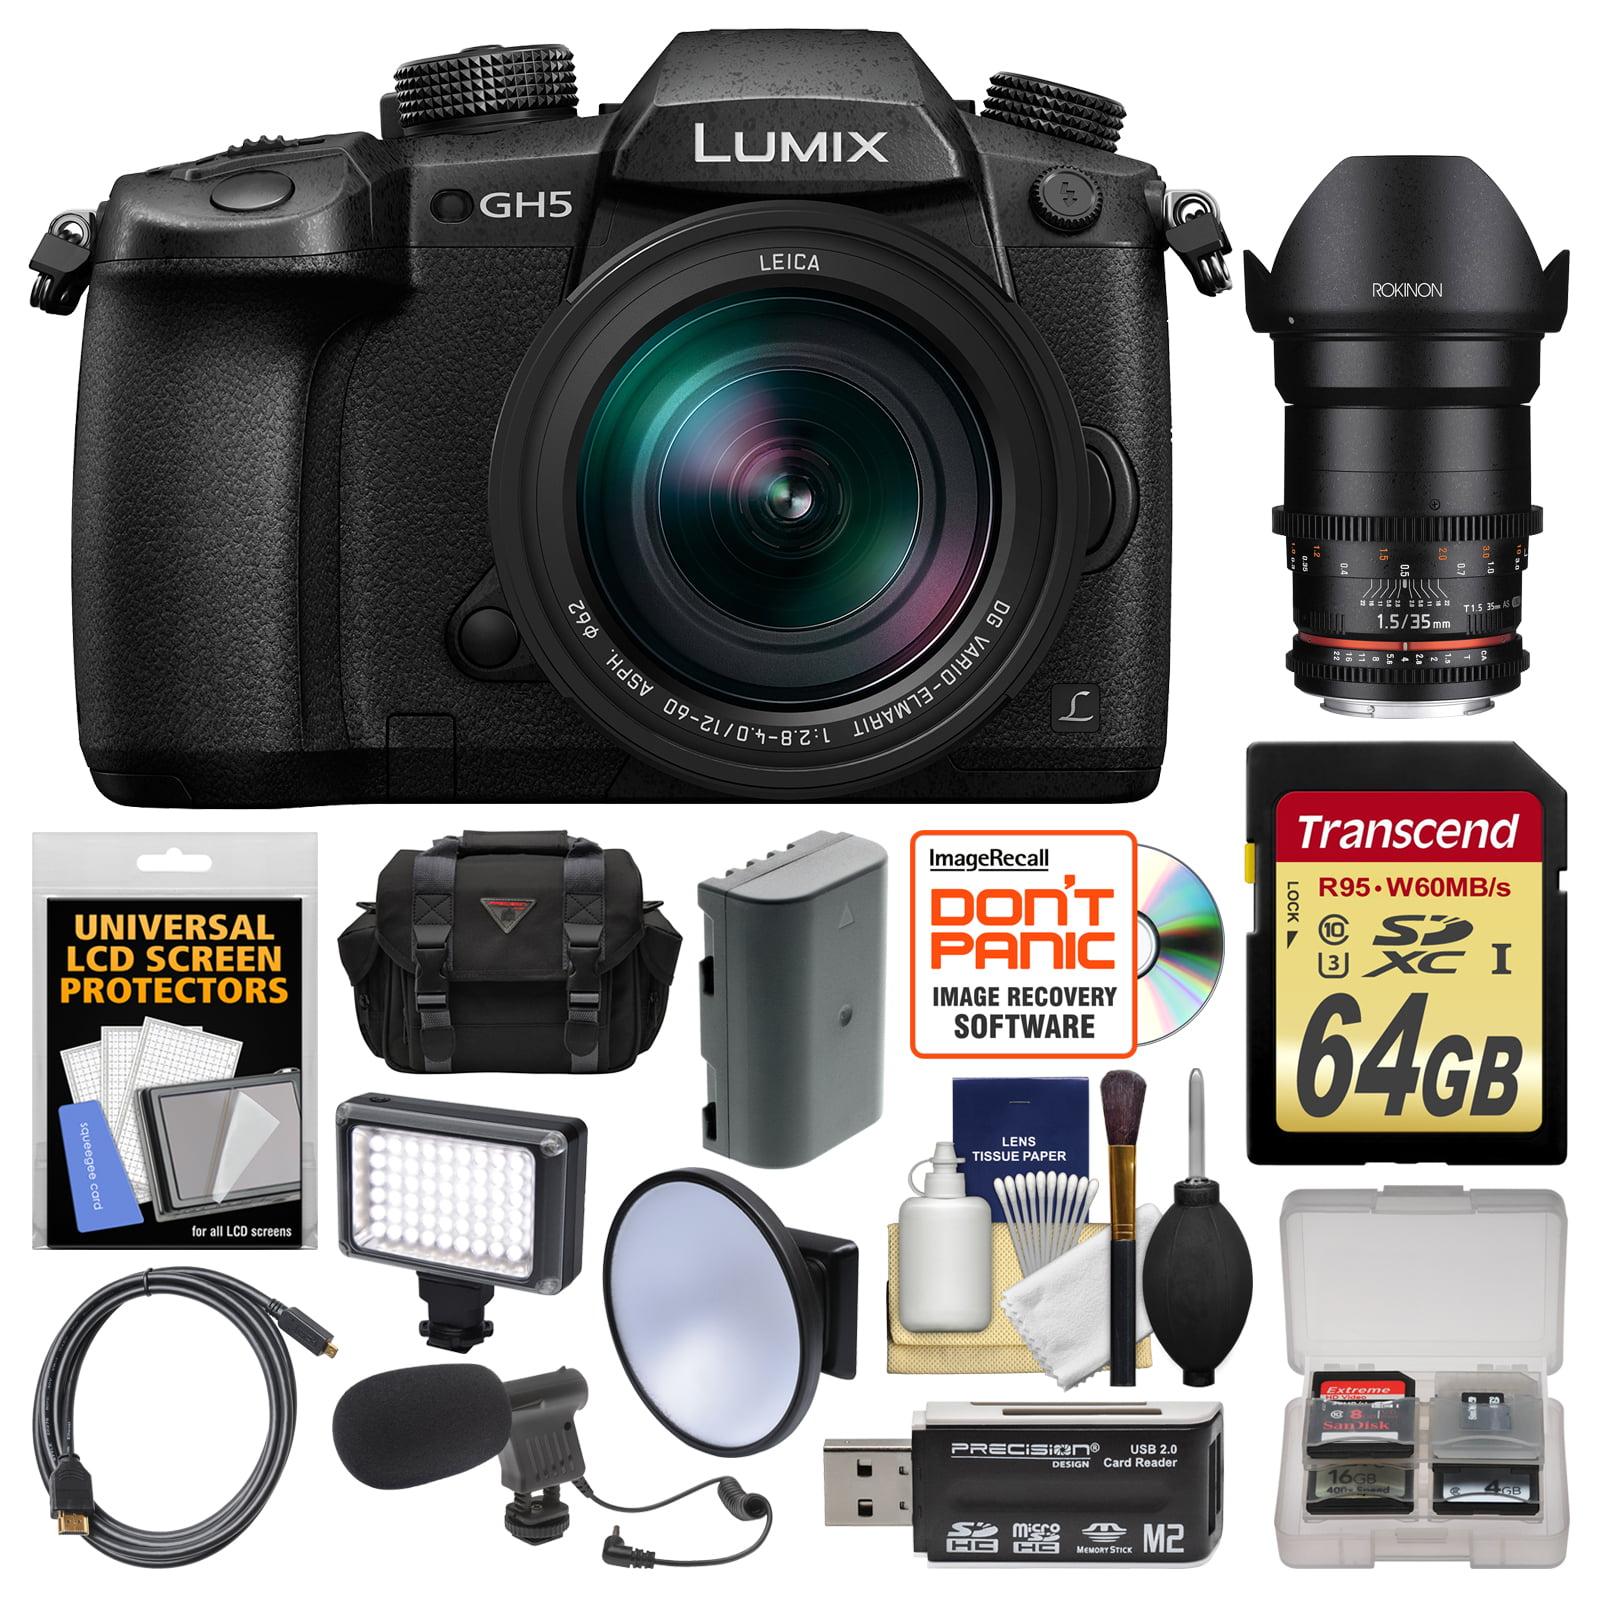 Panasonic Lumix DC-GH5 Wi-Fi 4K Digital Camera & 12-60mm f 2.8-4.0 with 35mm T 1.5 Lens + 64GB Card + Case +... by Panasonic